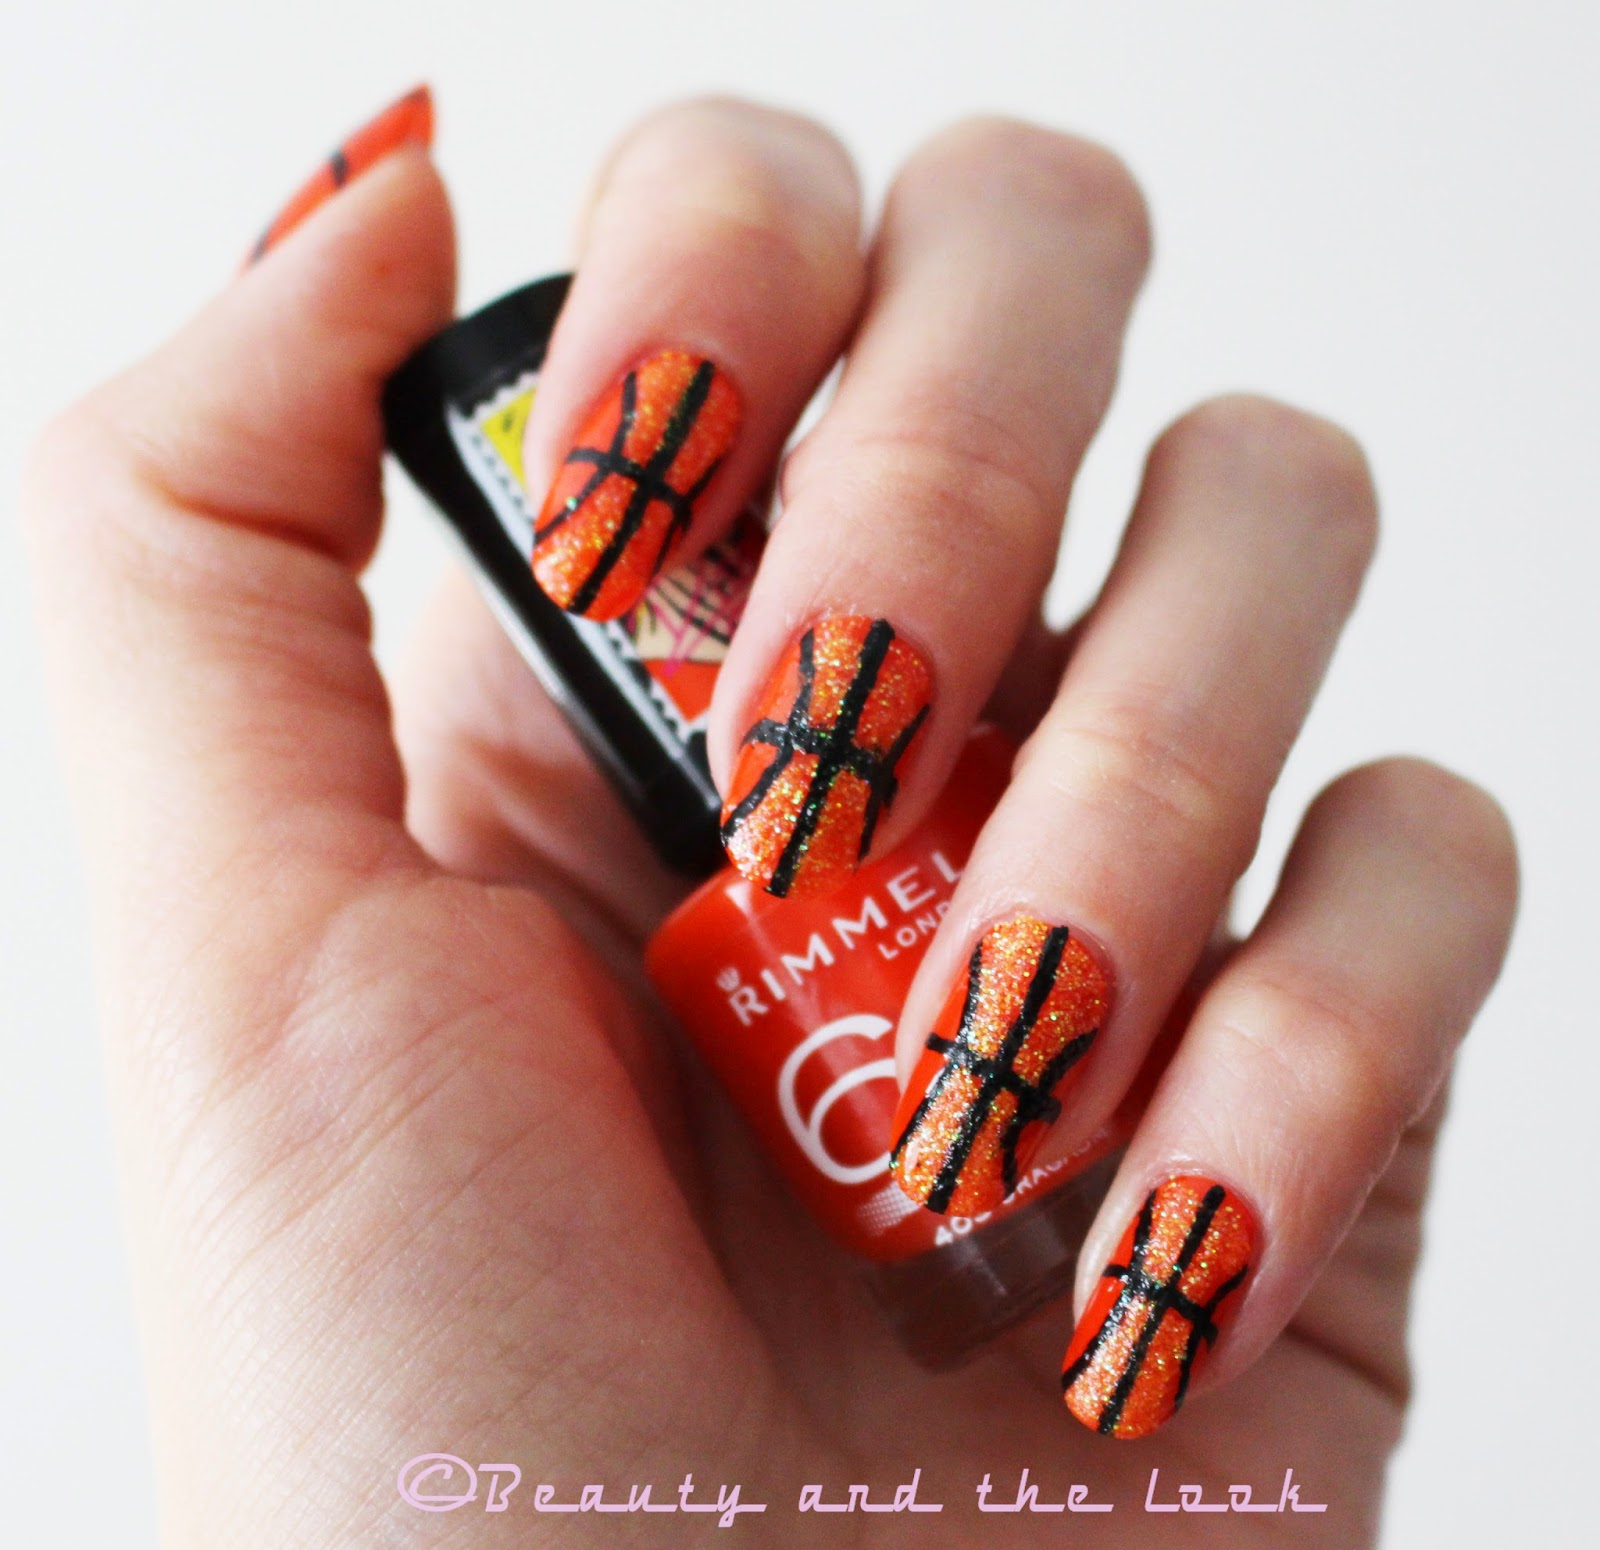 Basketball nails fiba world cup 2014 beautythelook basketball nails fiba world cup 2014 prinsesfo Choice Image